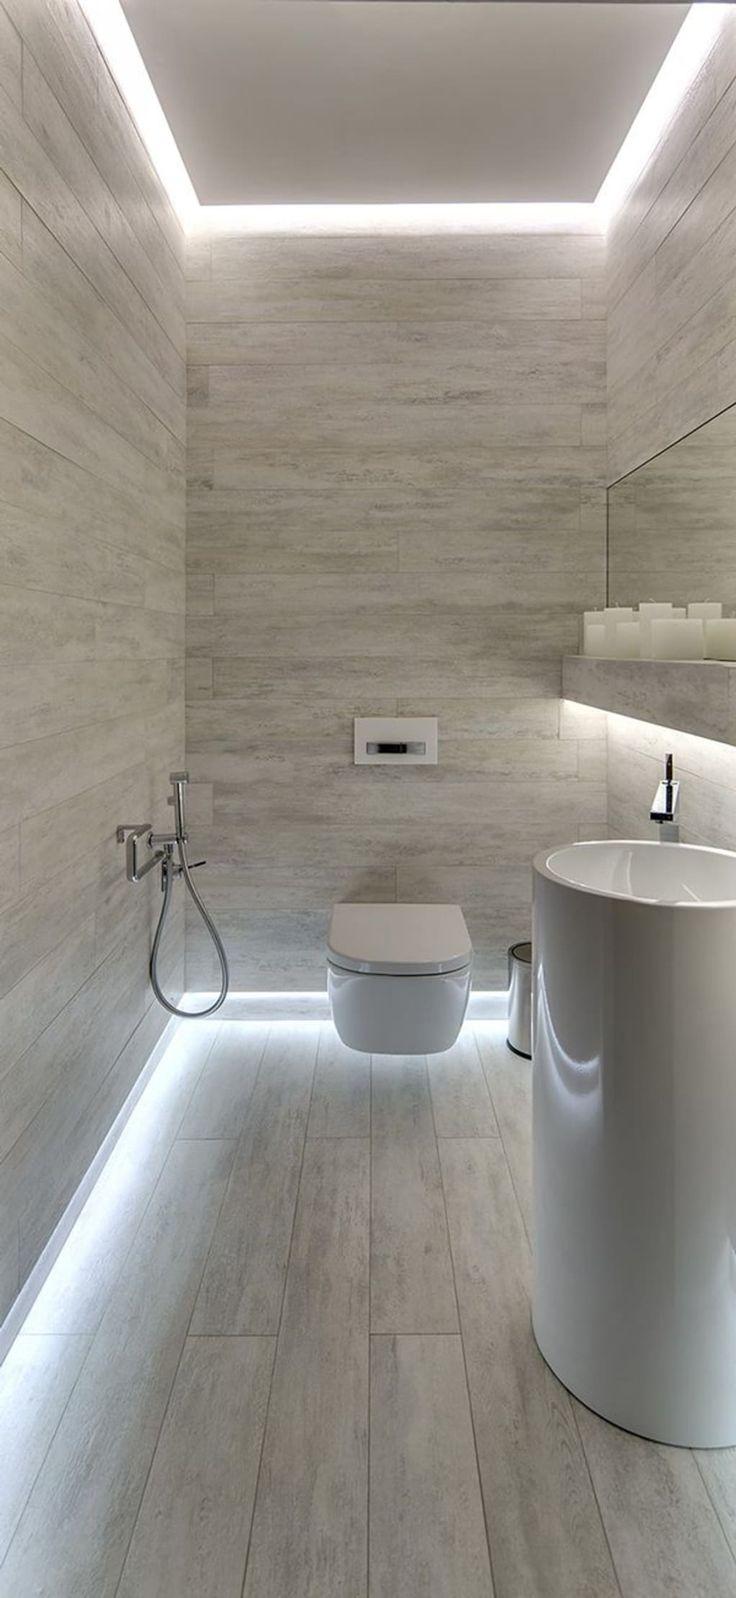 Badezimmer ideen halb geflieste wände  best Ванна images on pinterest  bathroom bathroom ideas and half